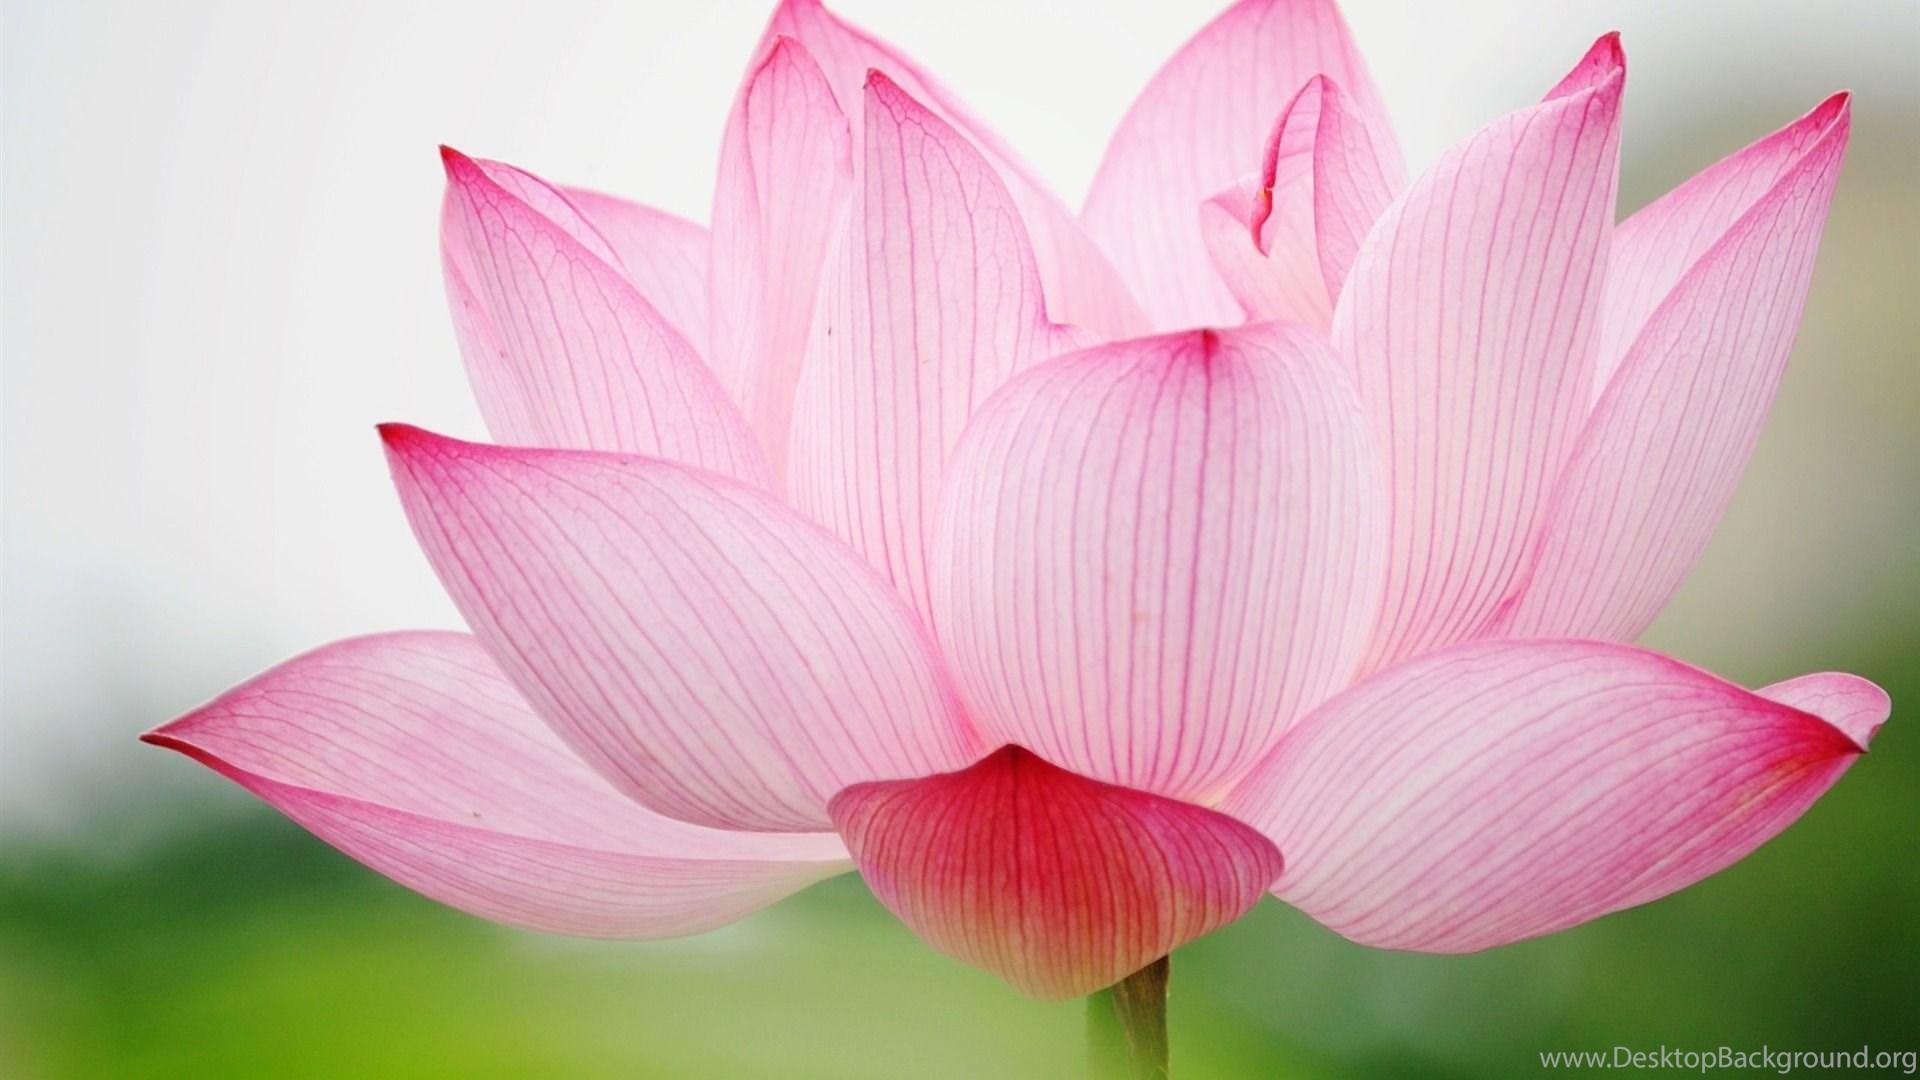 White Lotus Flower Wallpapers Hd Desktop Background